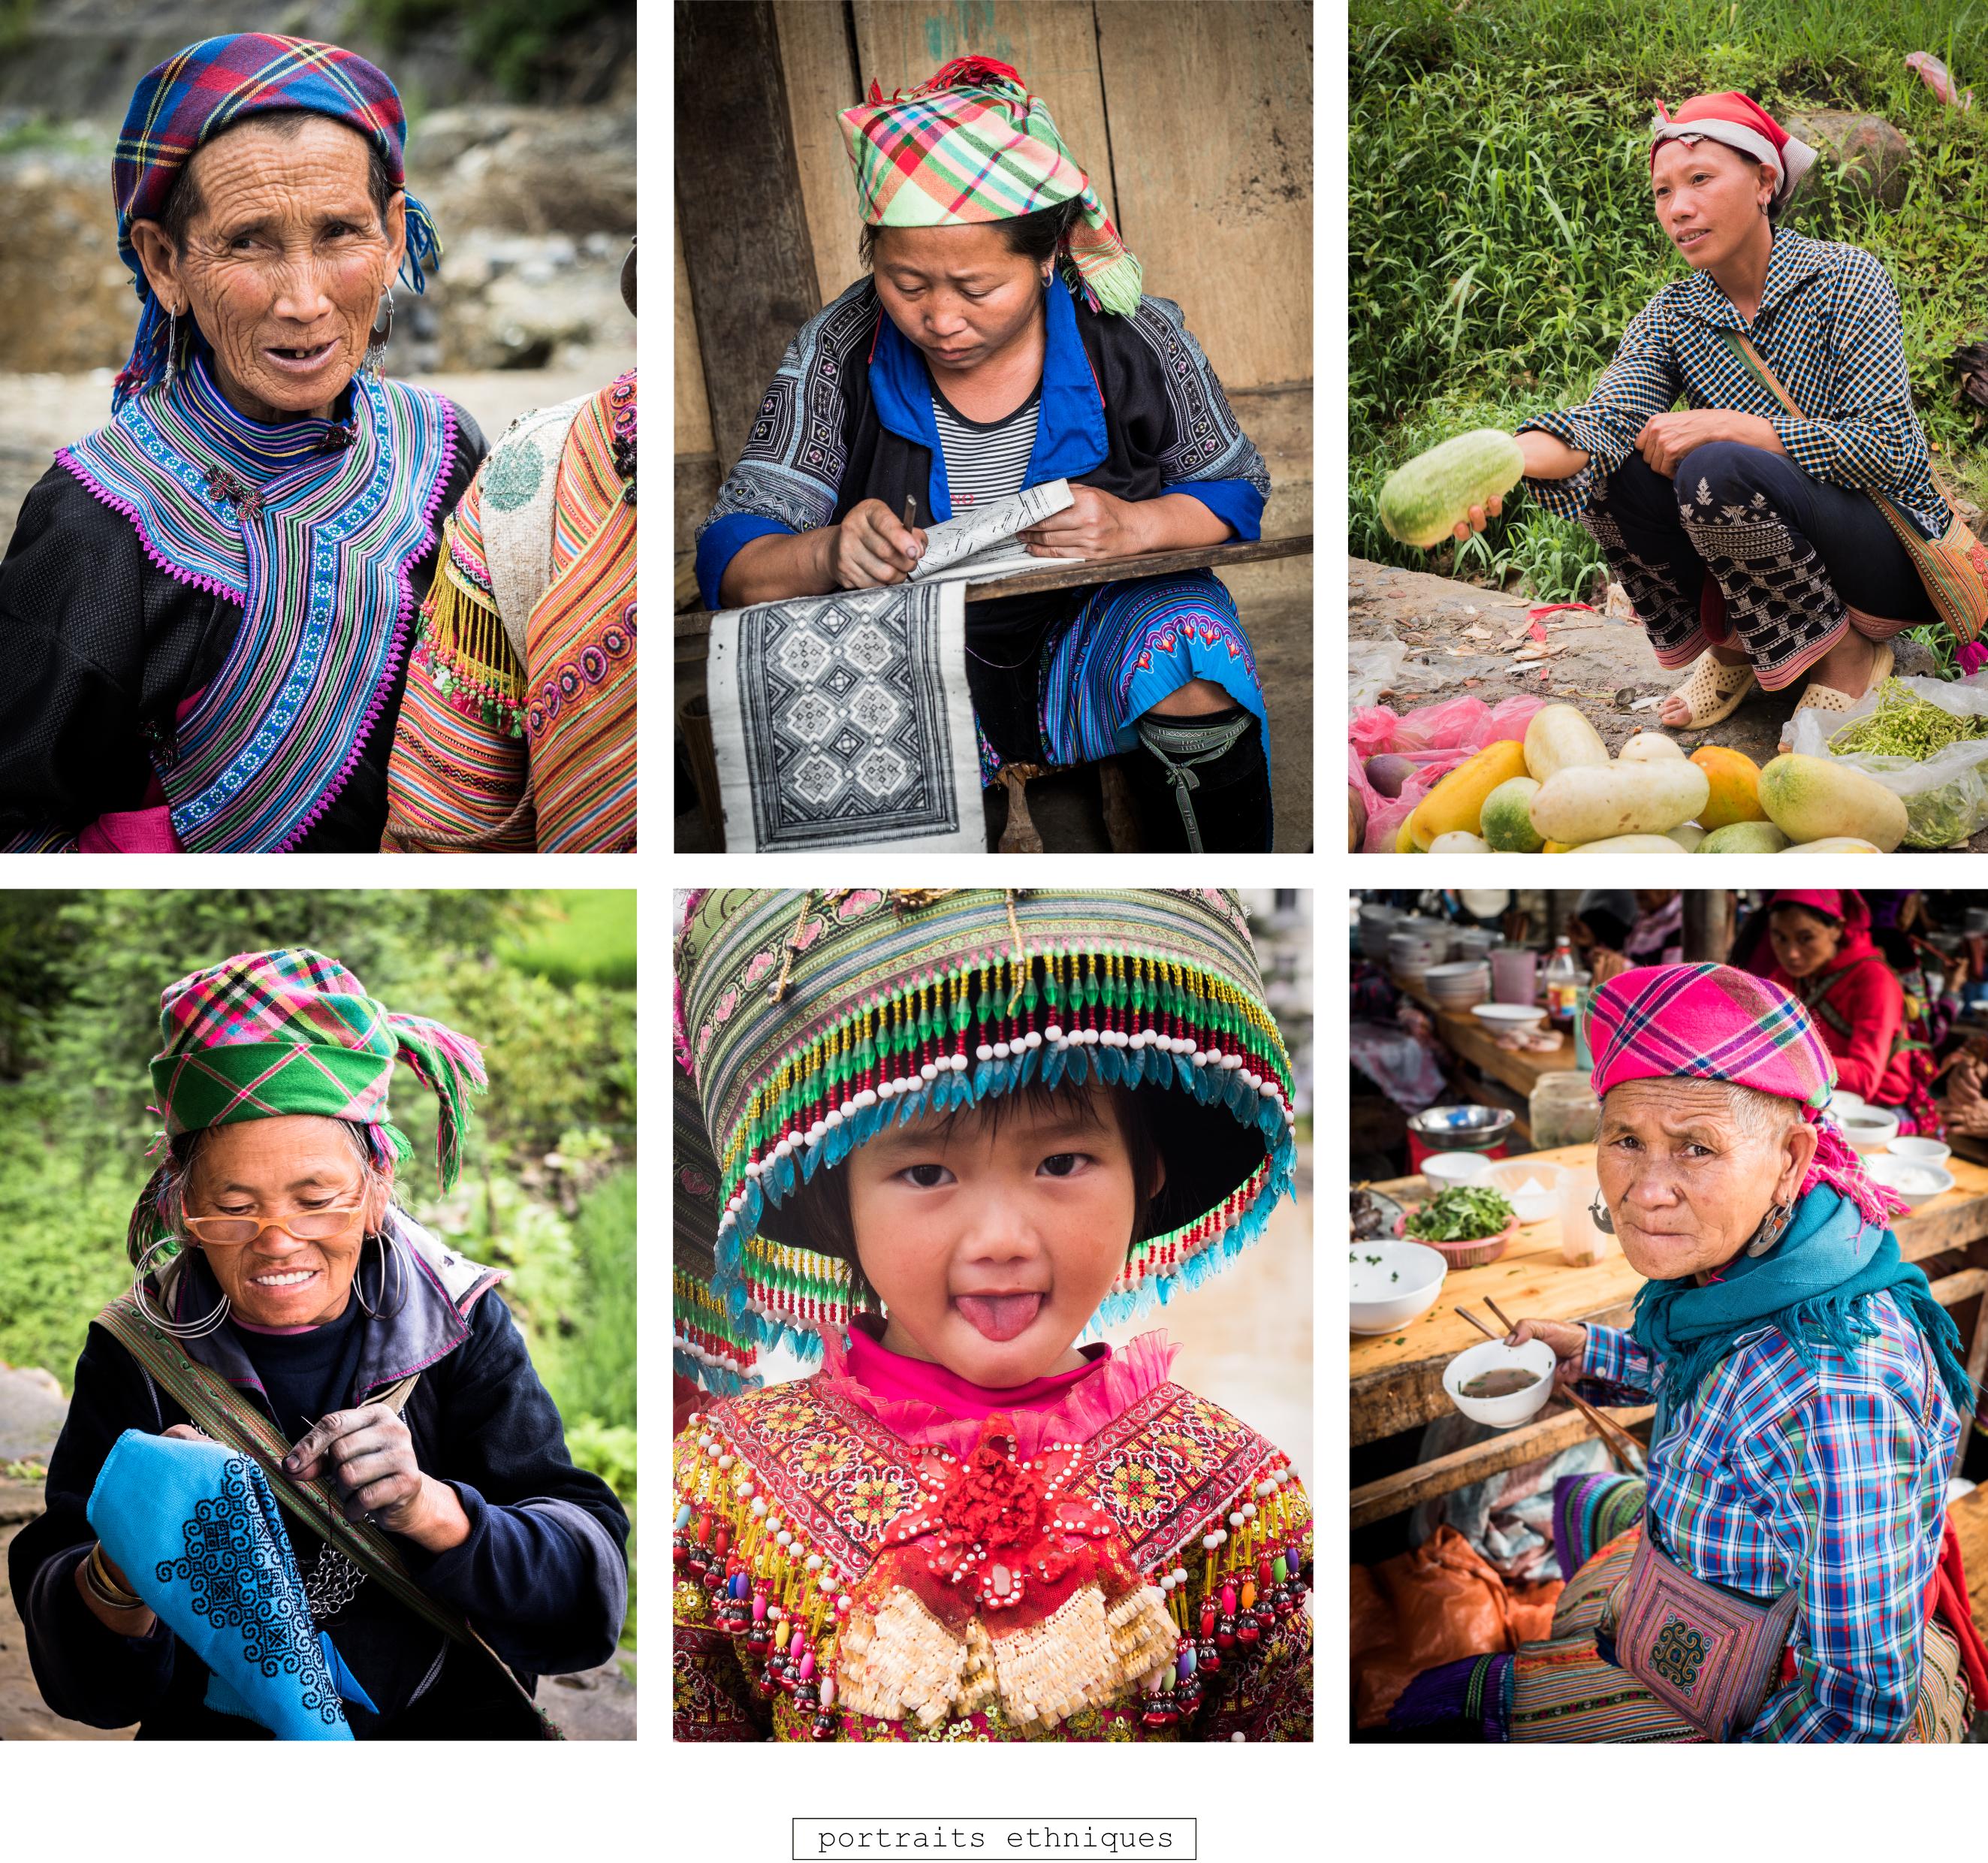 vietnam - asie - visiter le nord du vietnam - ethnies minoritaires